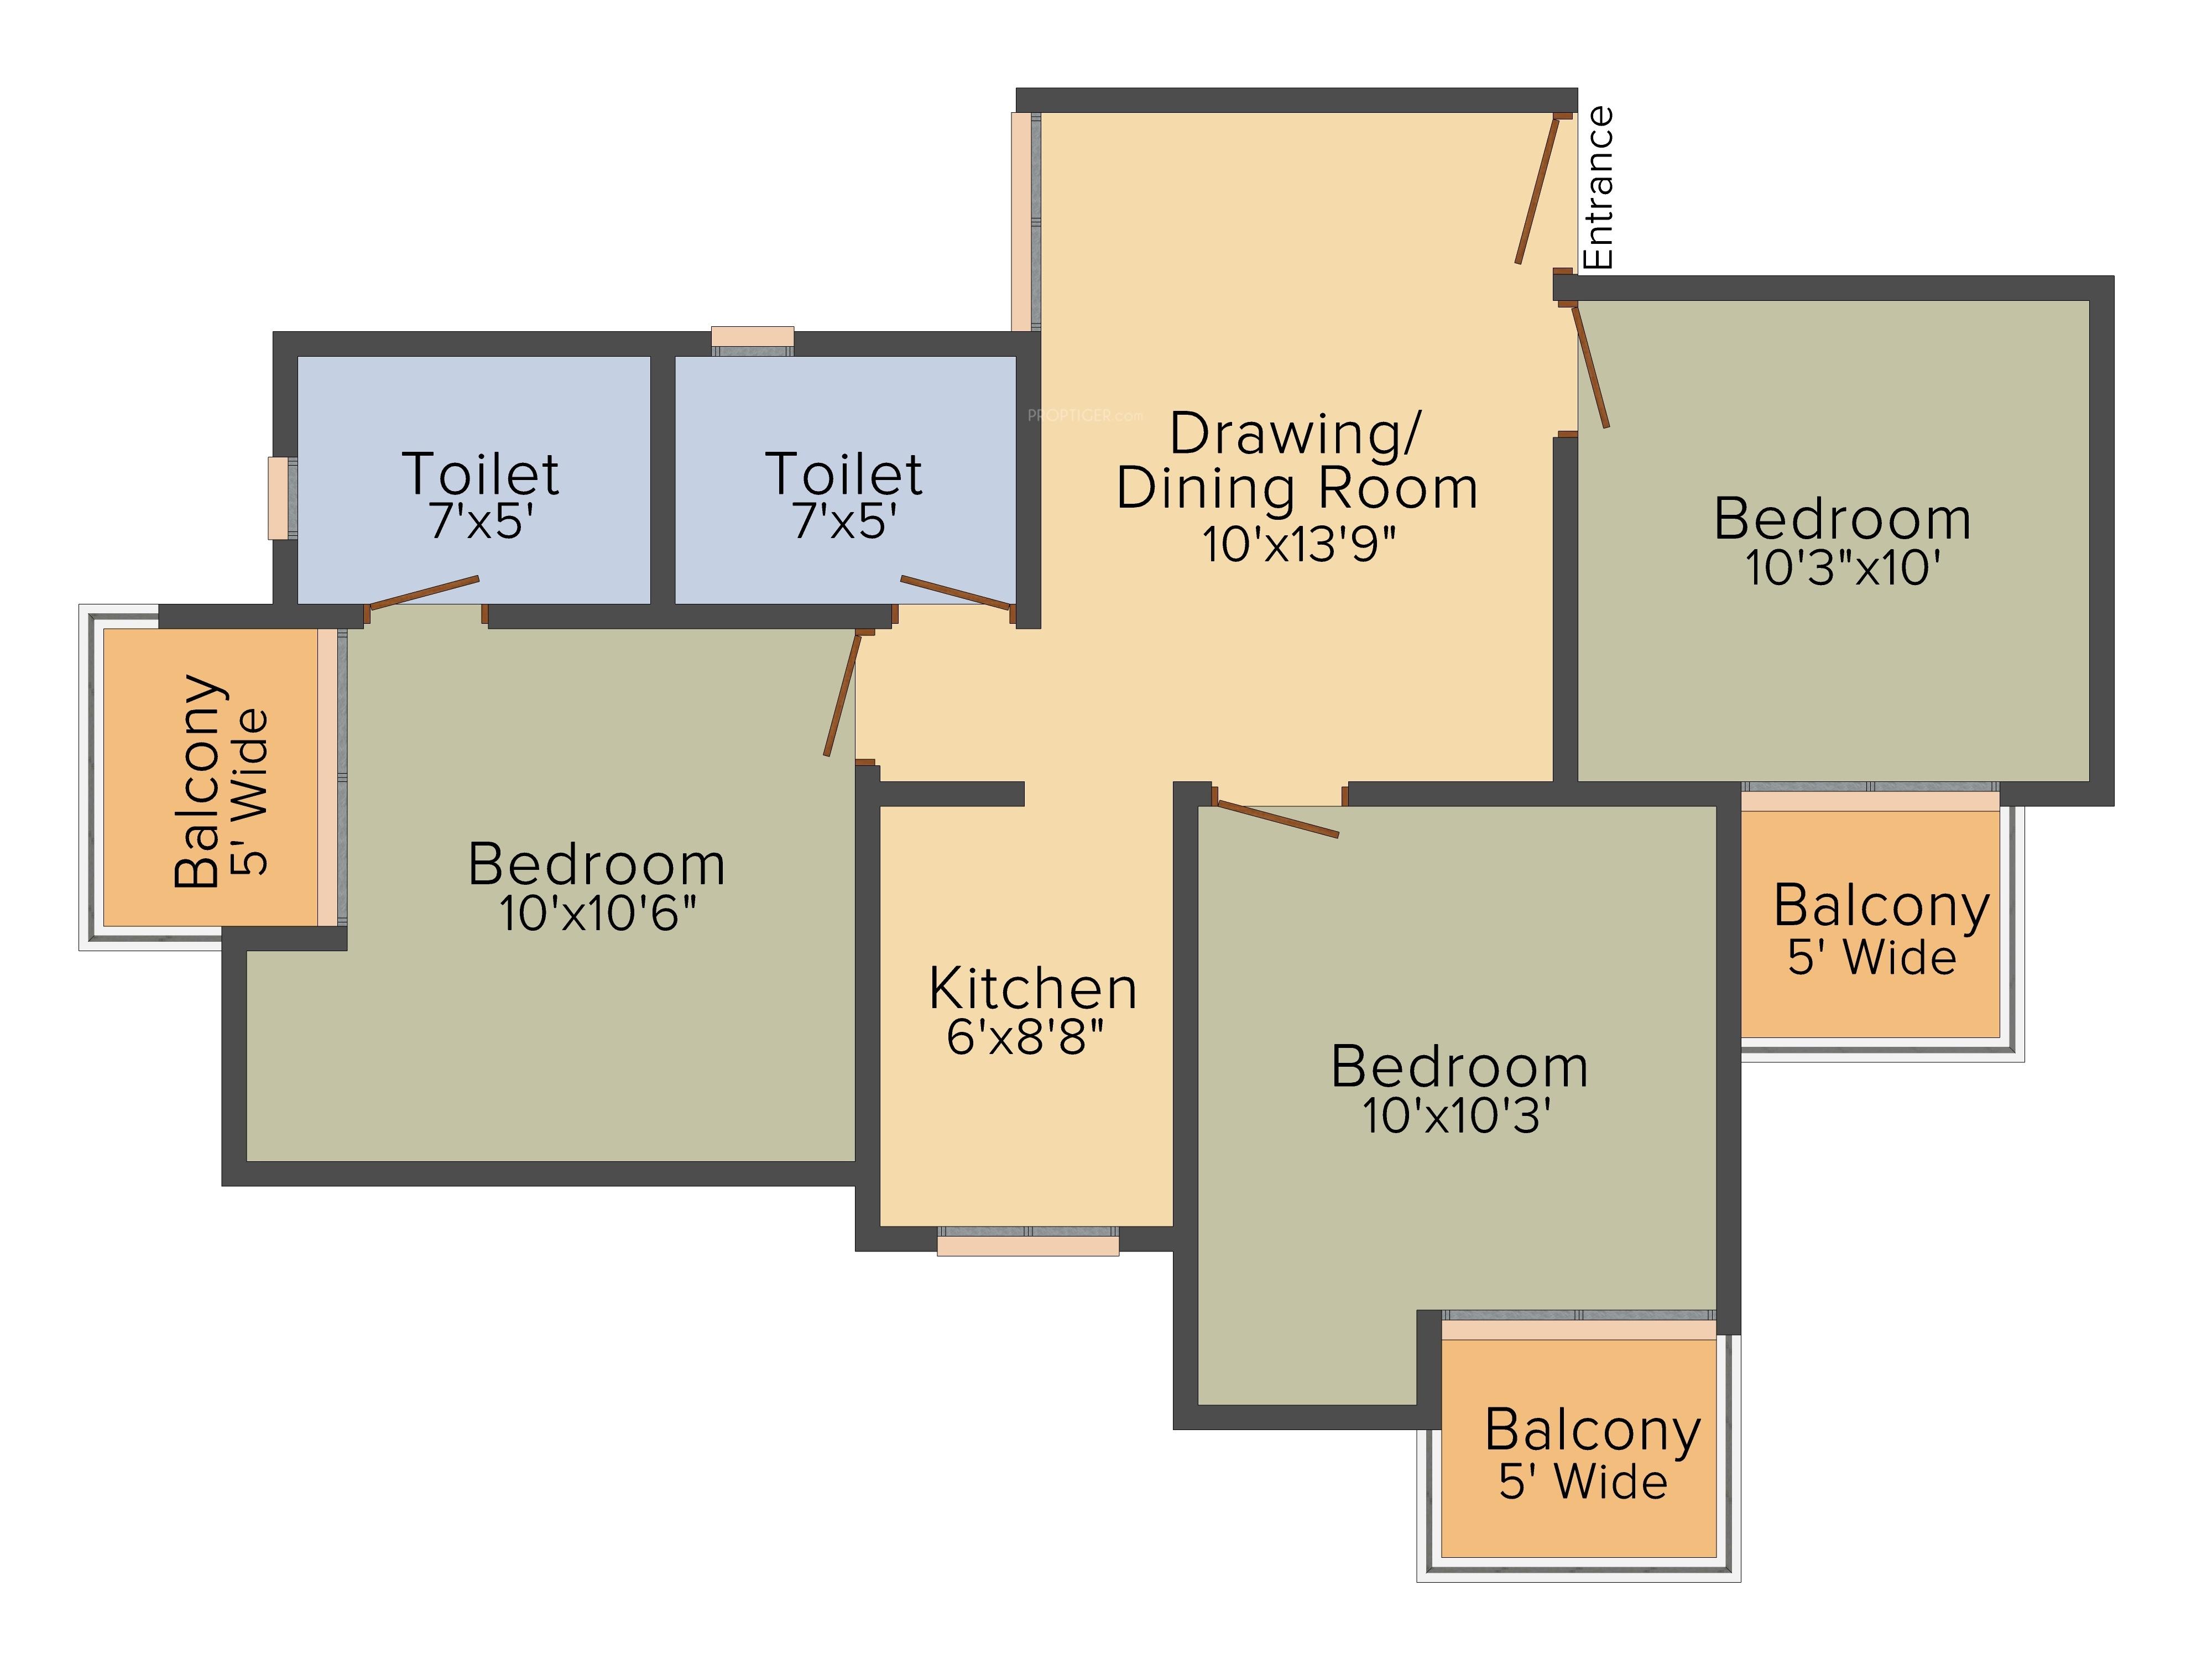 Migsun Wynn In Eta 2 Greater Noida Price Location Map Floor Alpha Sun Tanning Bed Wiring Diagram More Photos